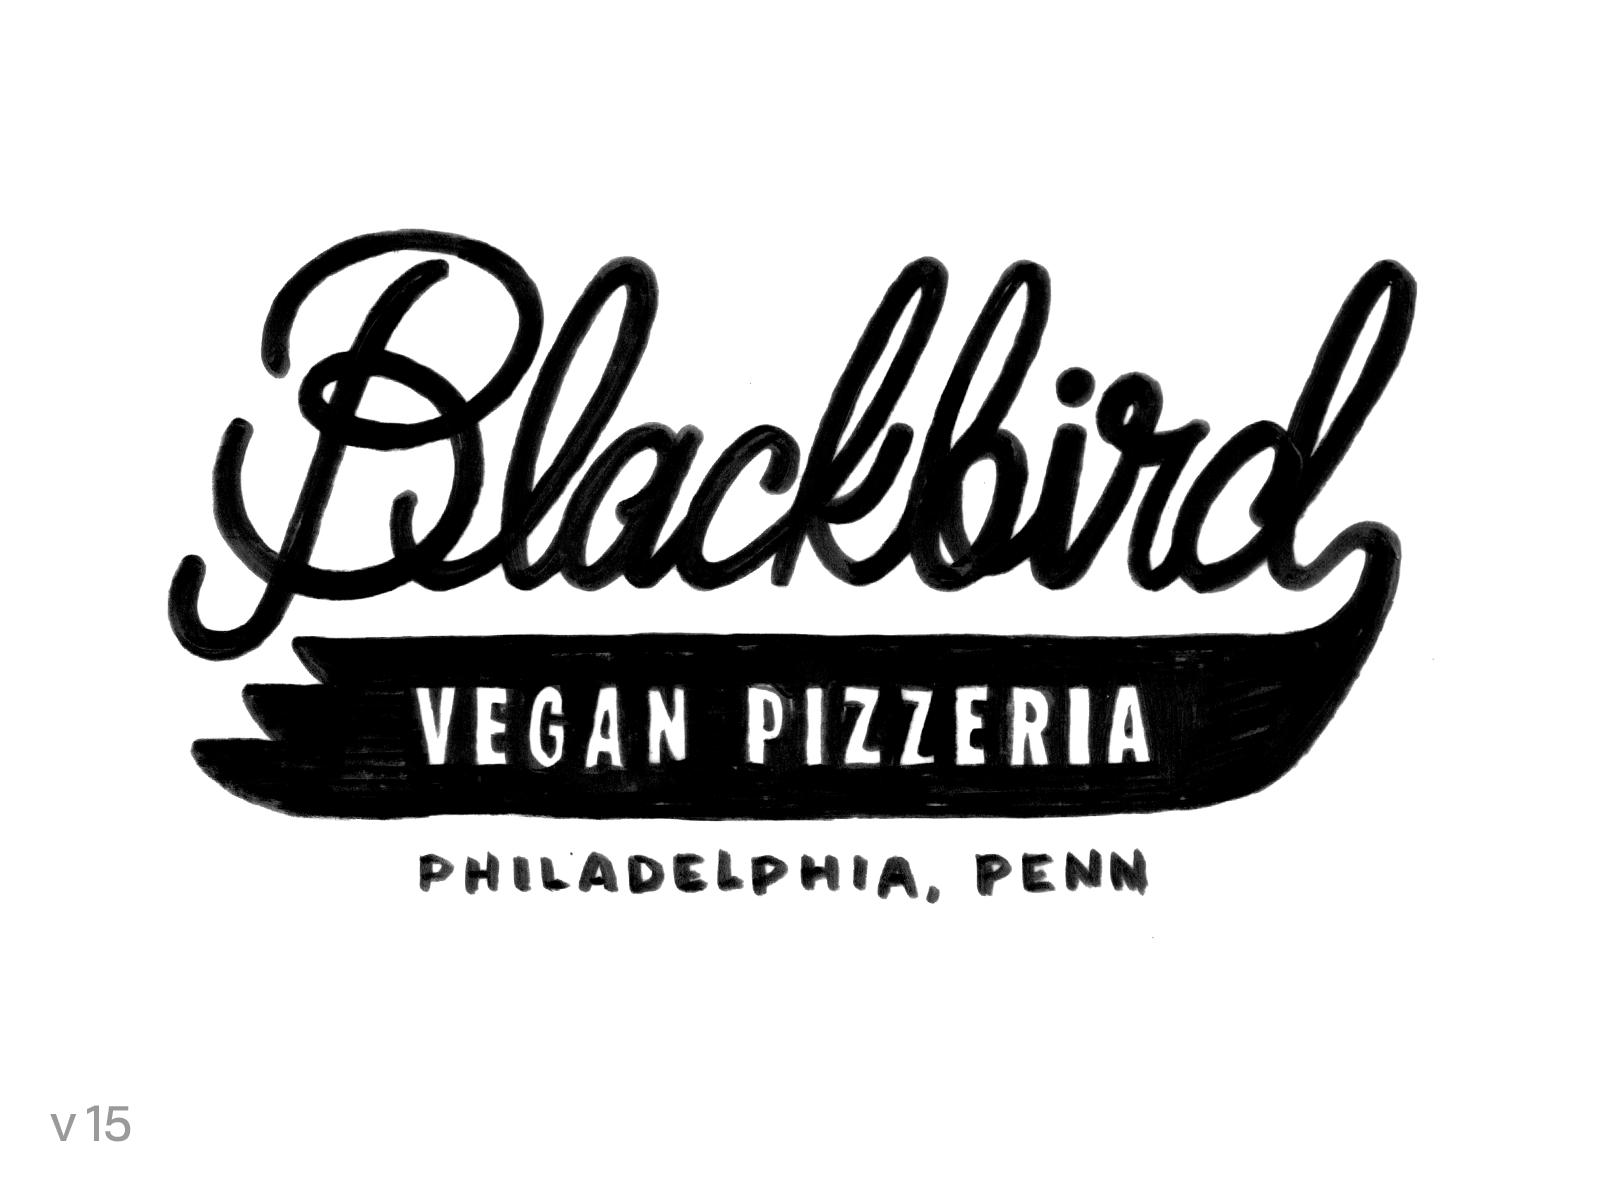 Blackbird_PencilArt_p20.png